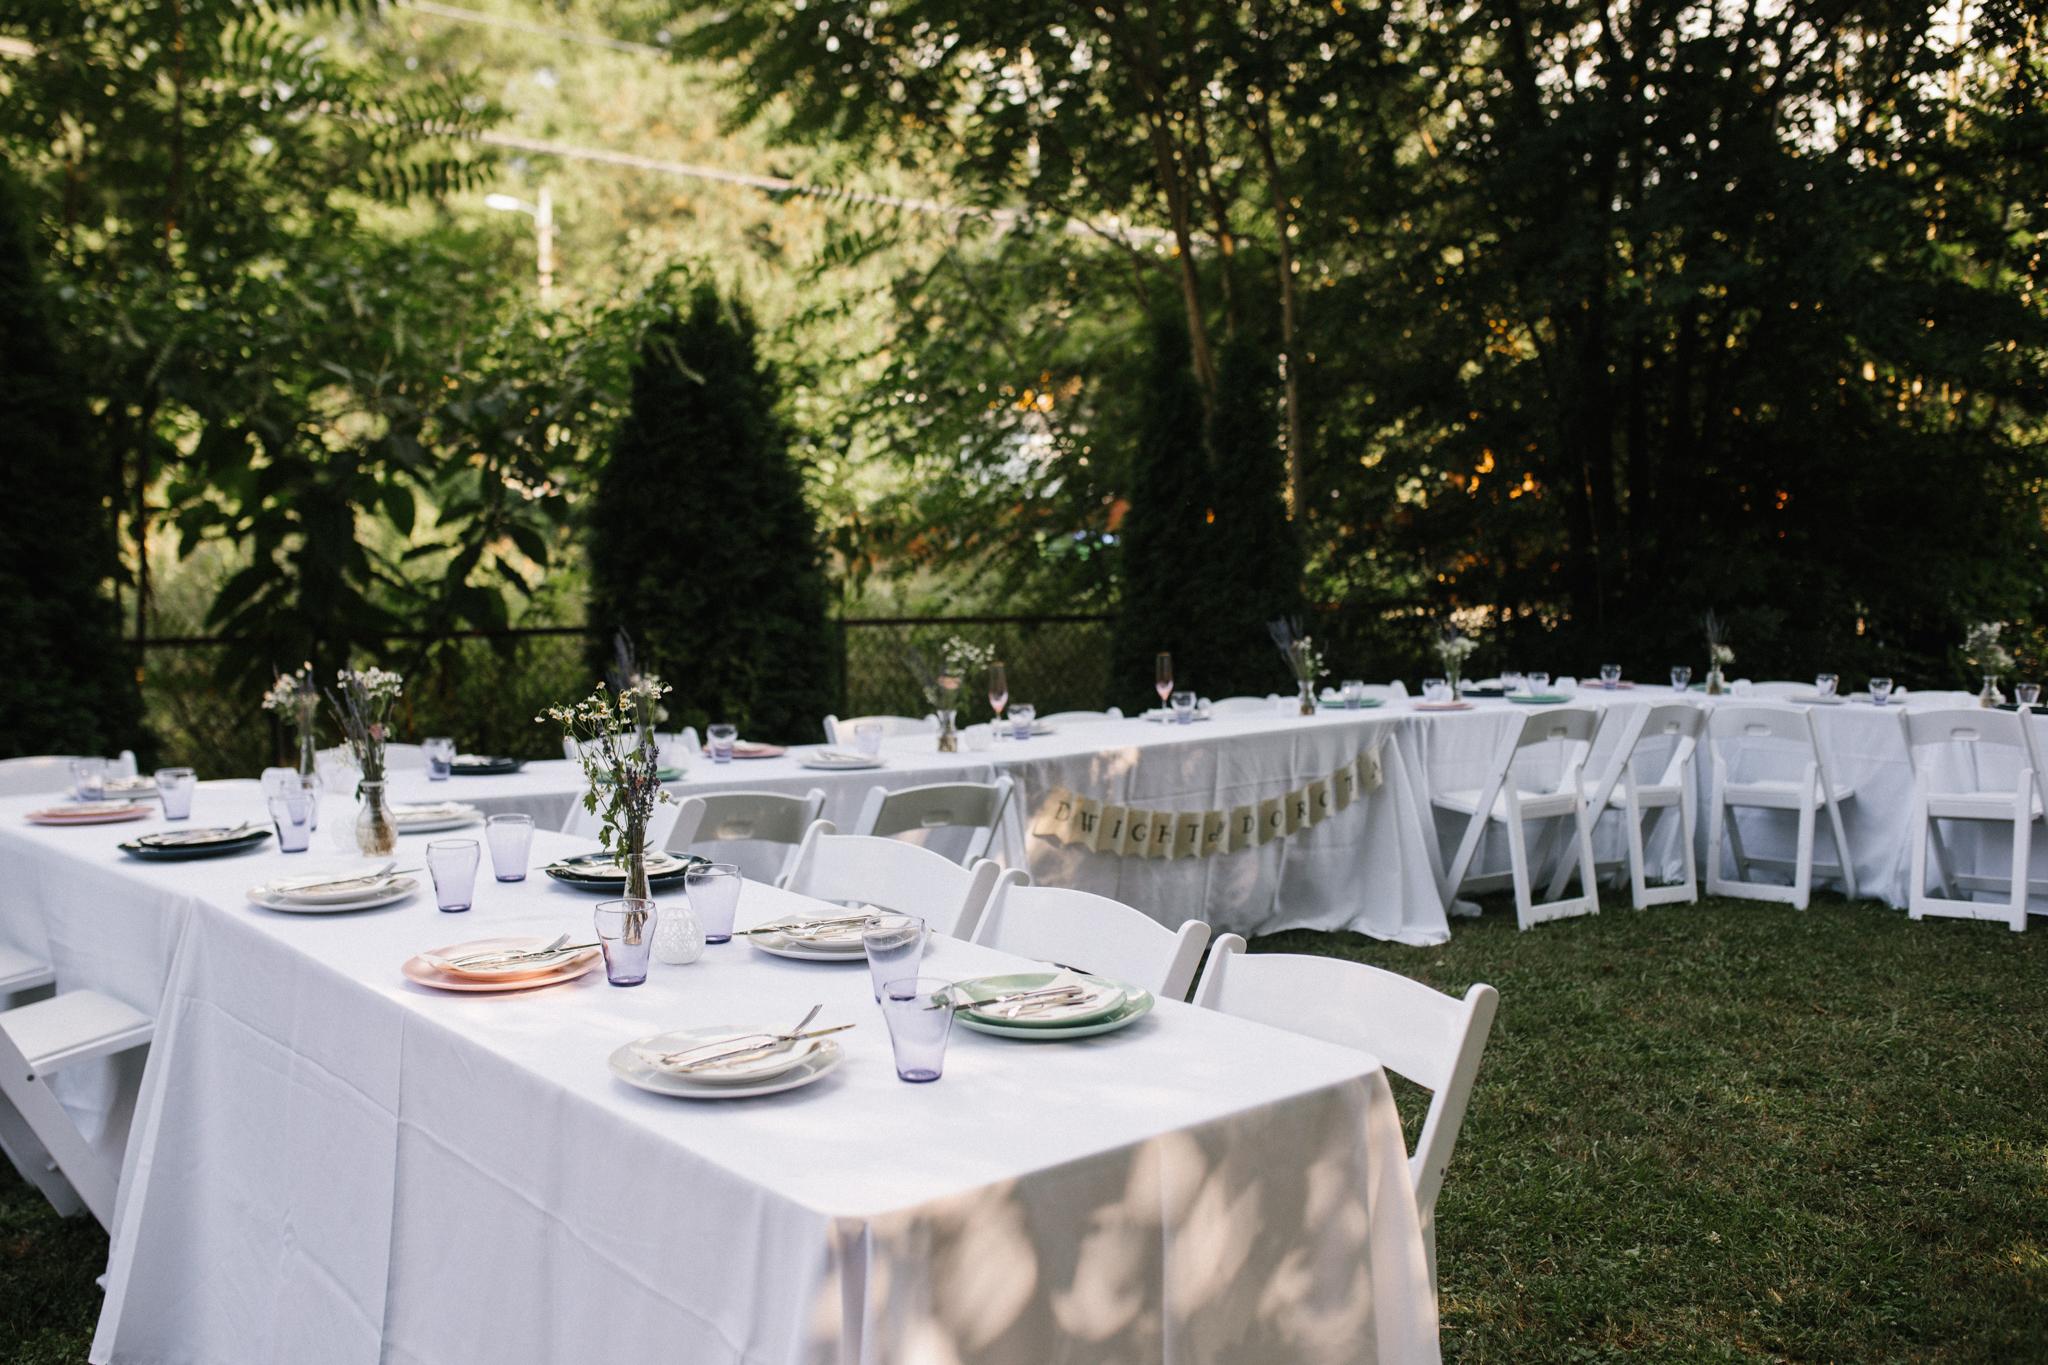 dorota_dwight_richmond_backyard_wedding-21.jpg